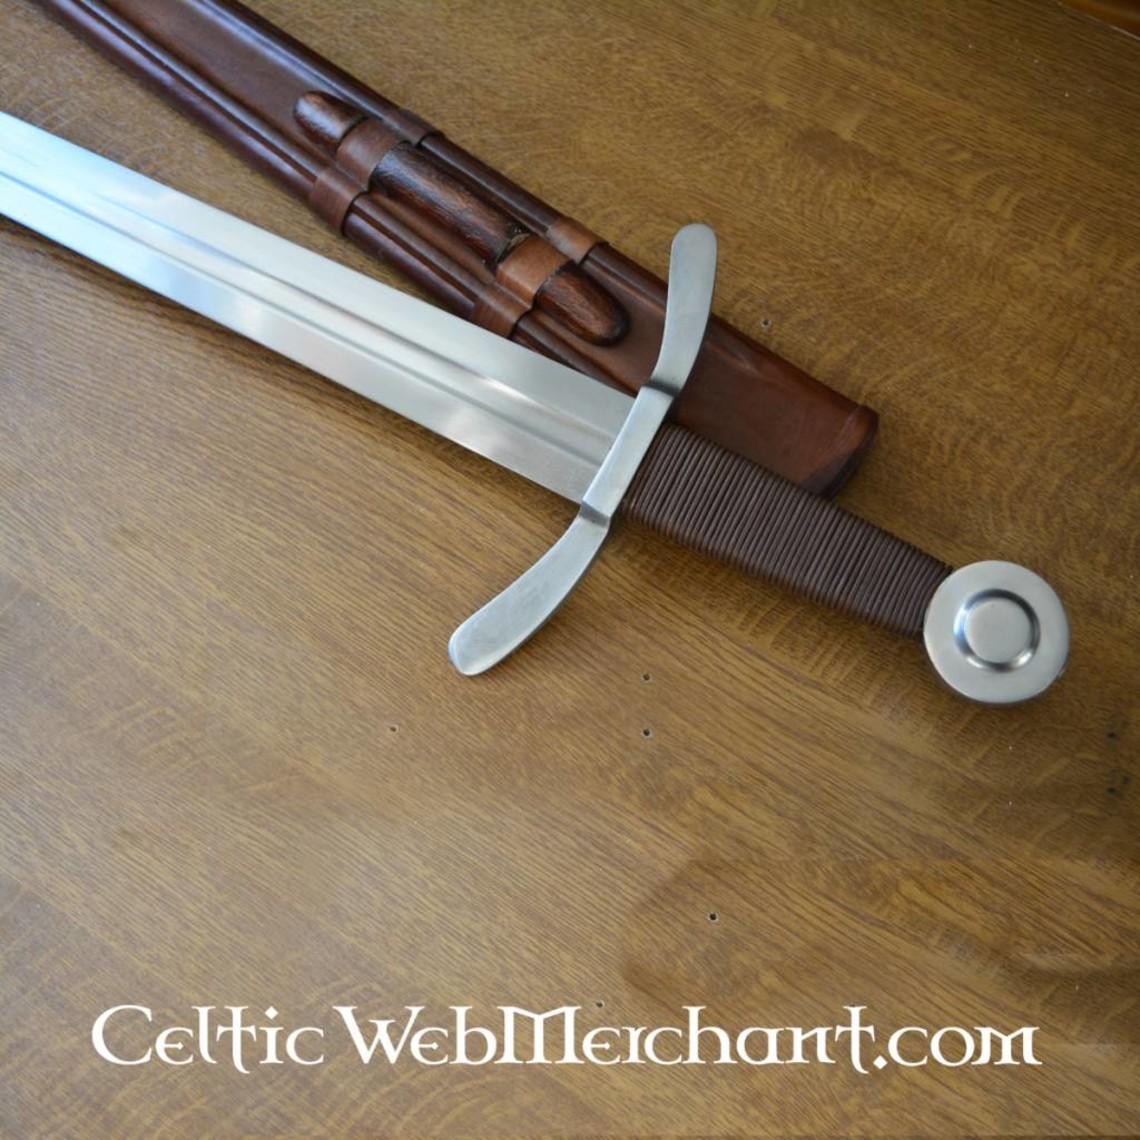 Deepeeka Mittelalterliches Kreuzritter Schwert